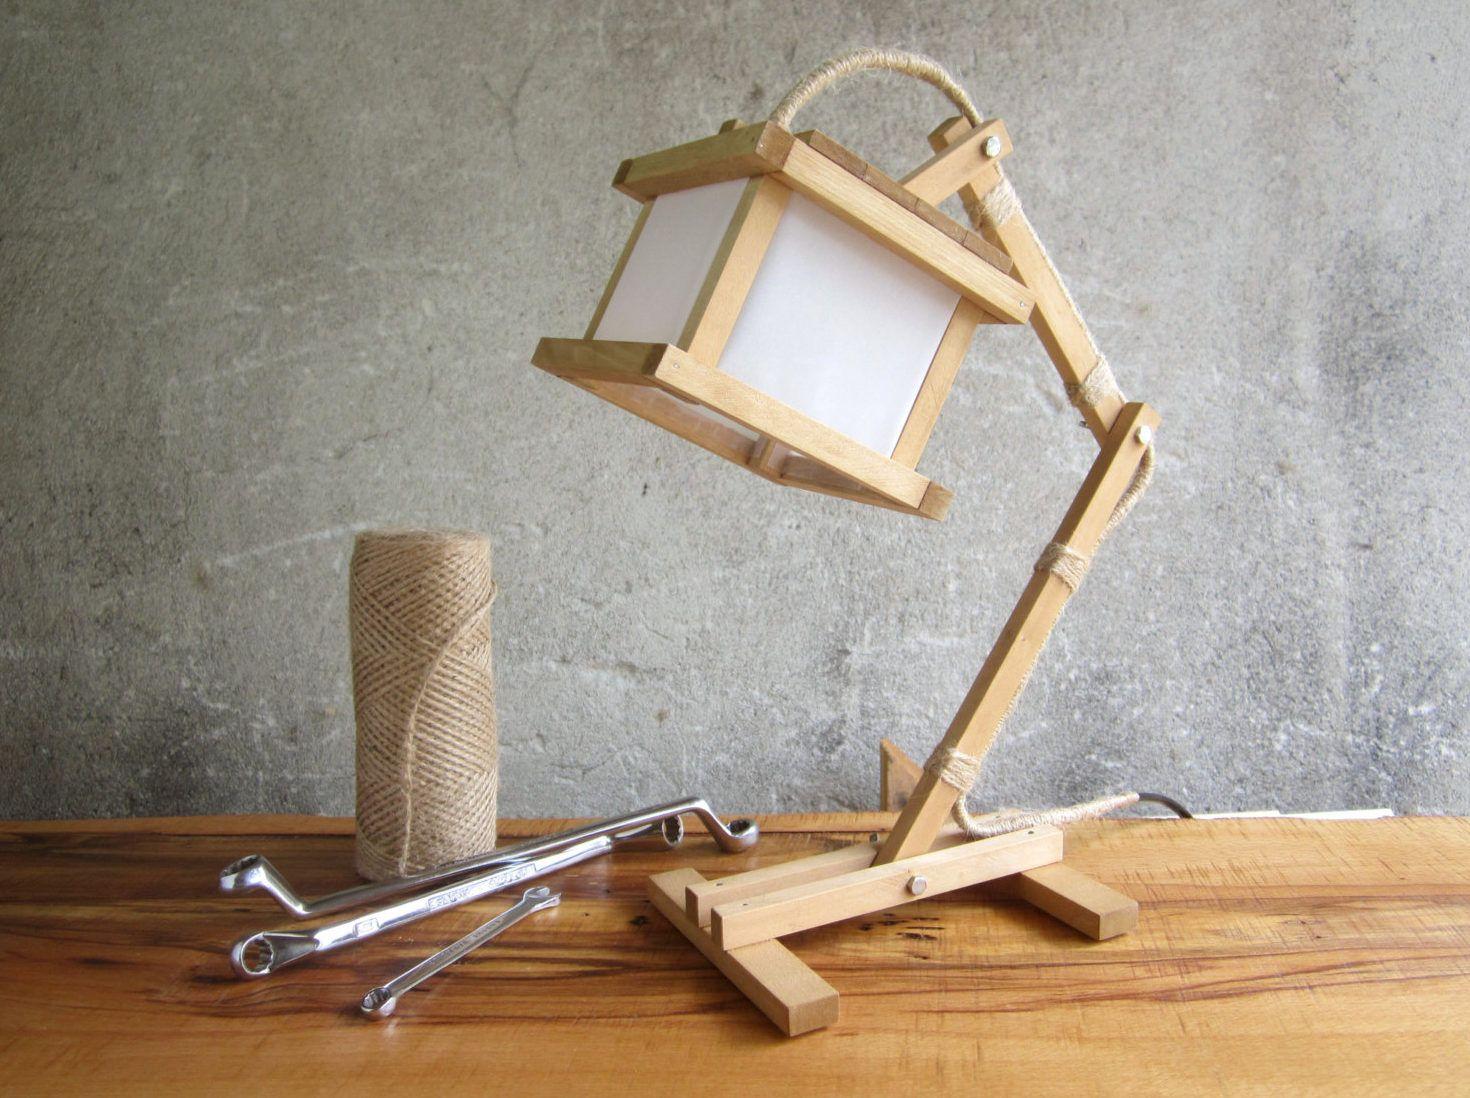 Image Result For Cool Desk Lamps